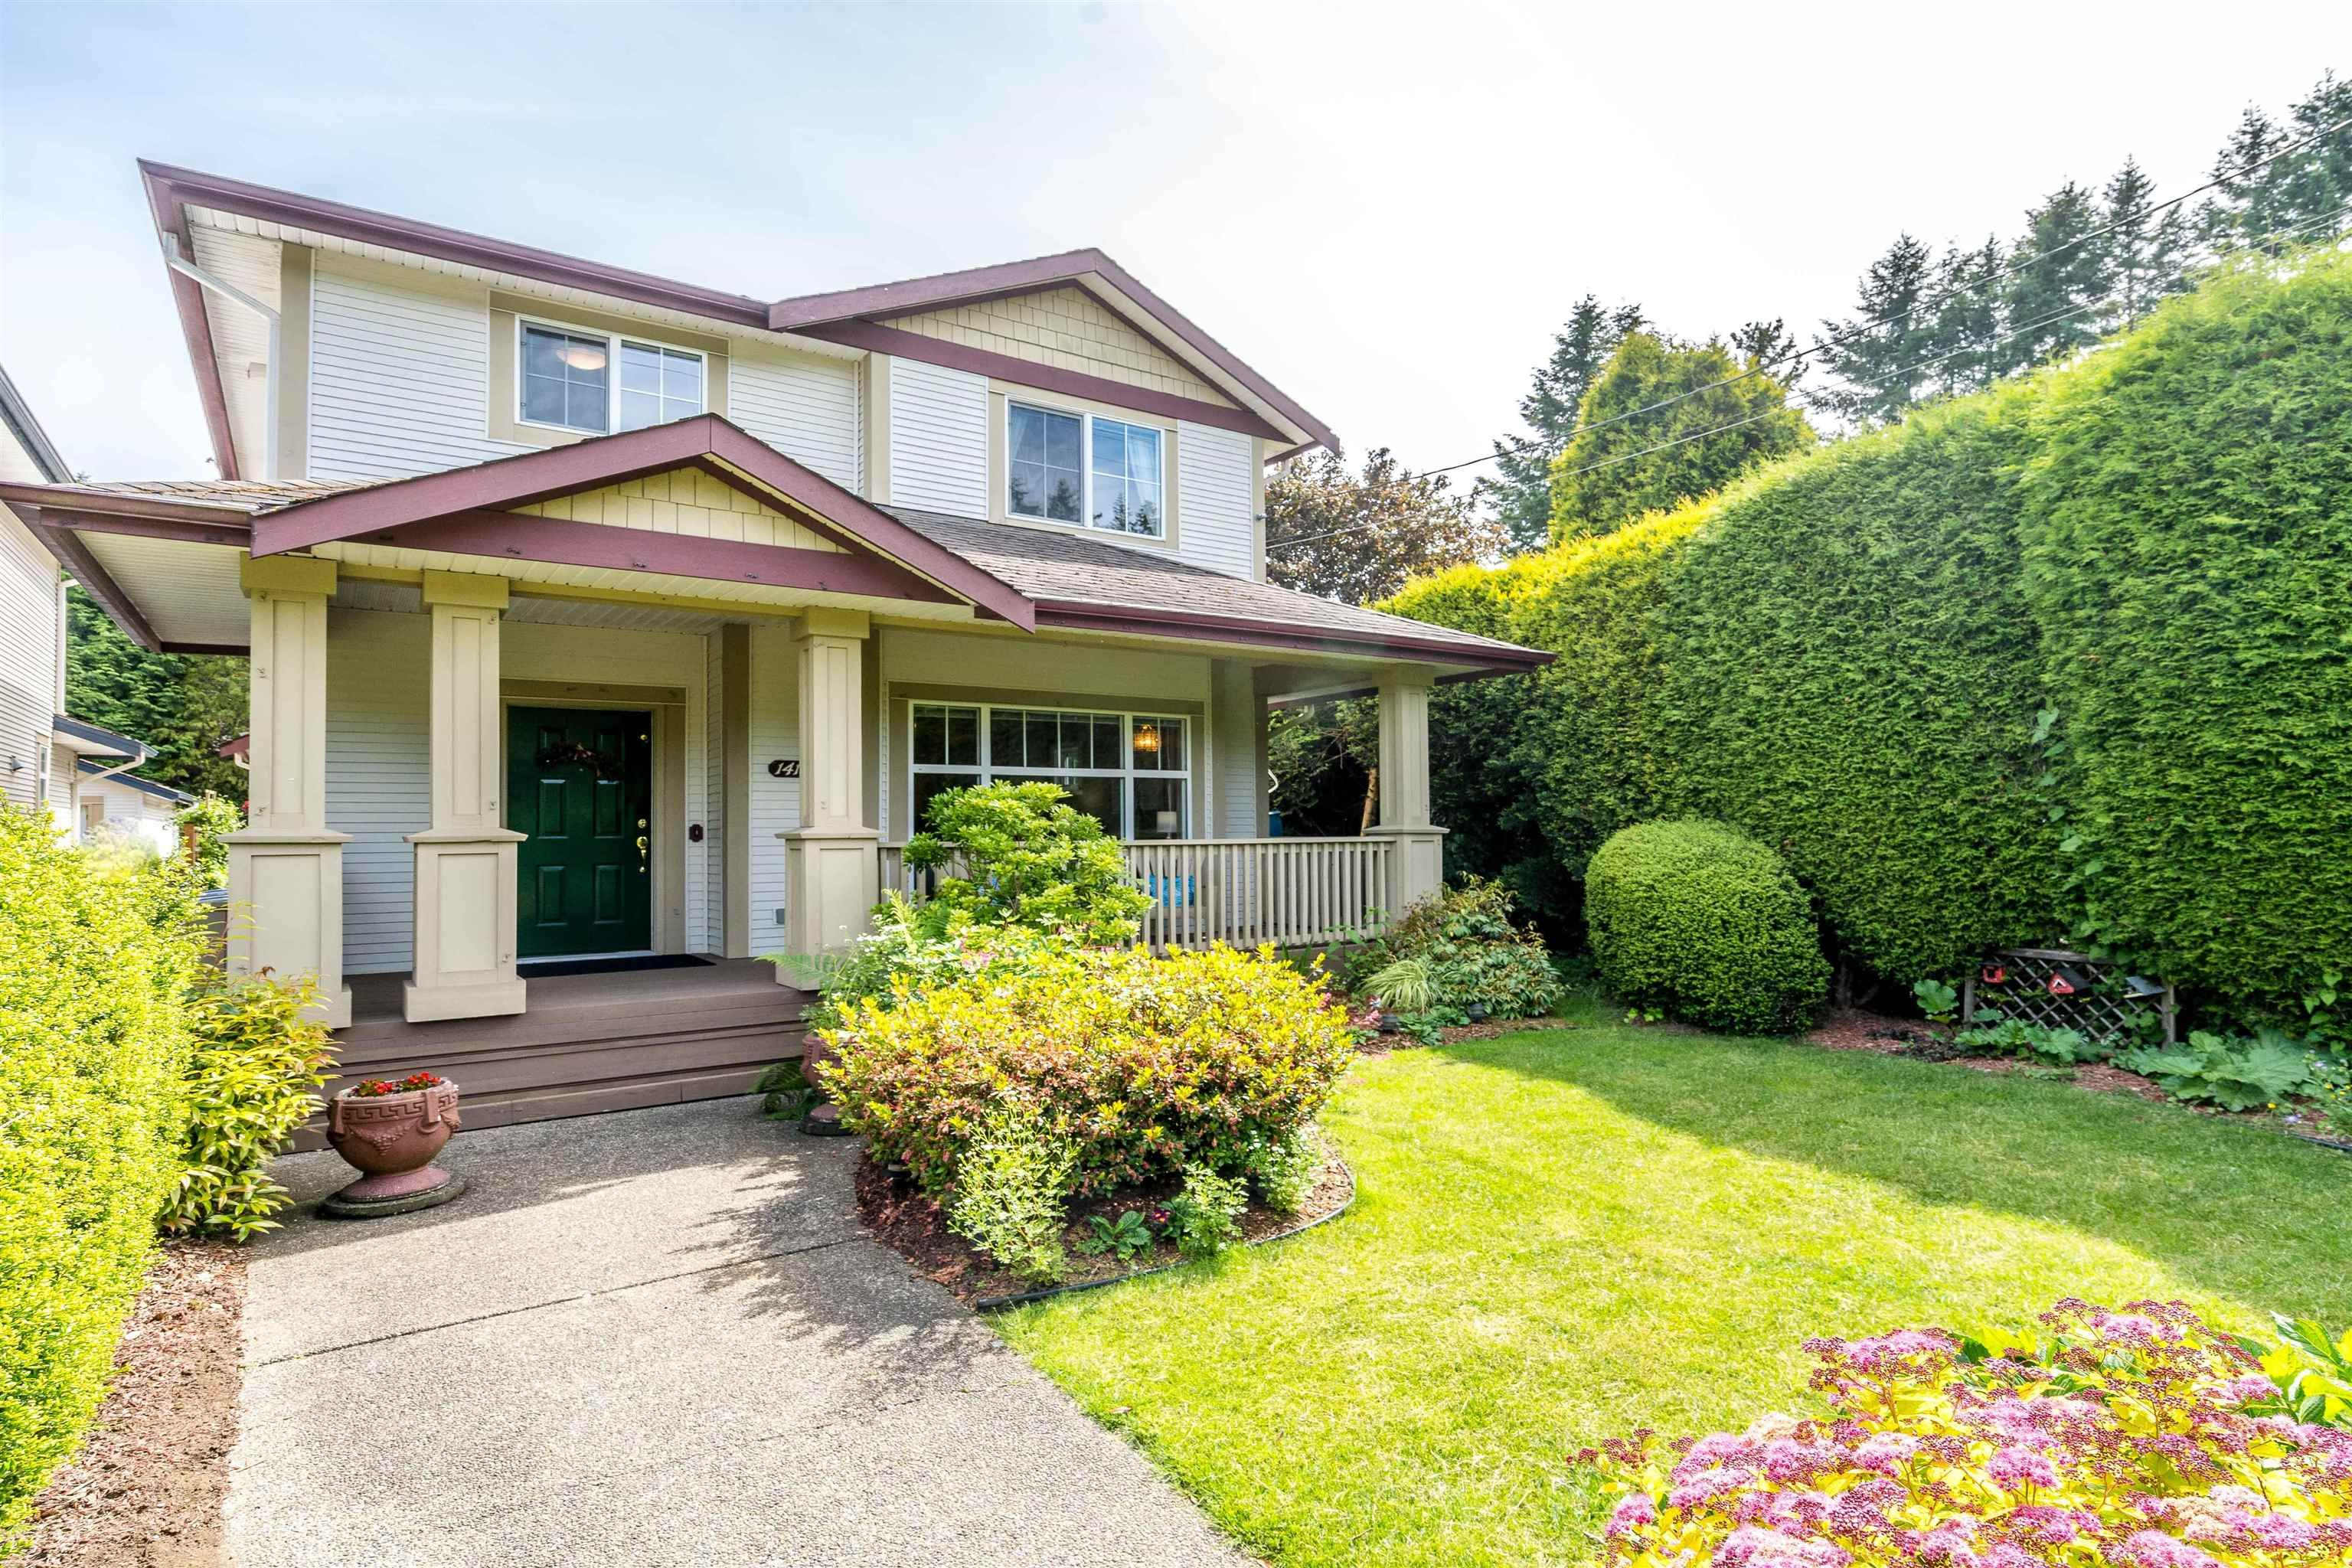 Main Photo: 14118 24 Avenue in Surrey: Sunnyside Park Surrey House for sale (South Surrey White Rock)  : MLS®# R2613487